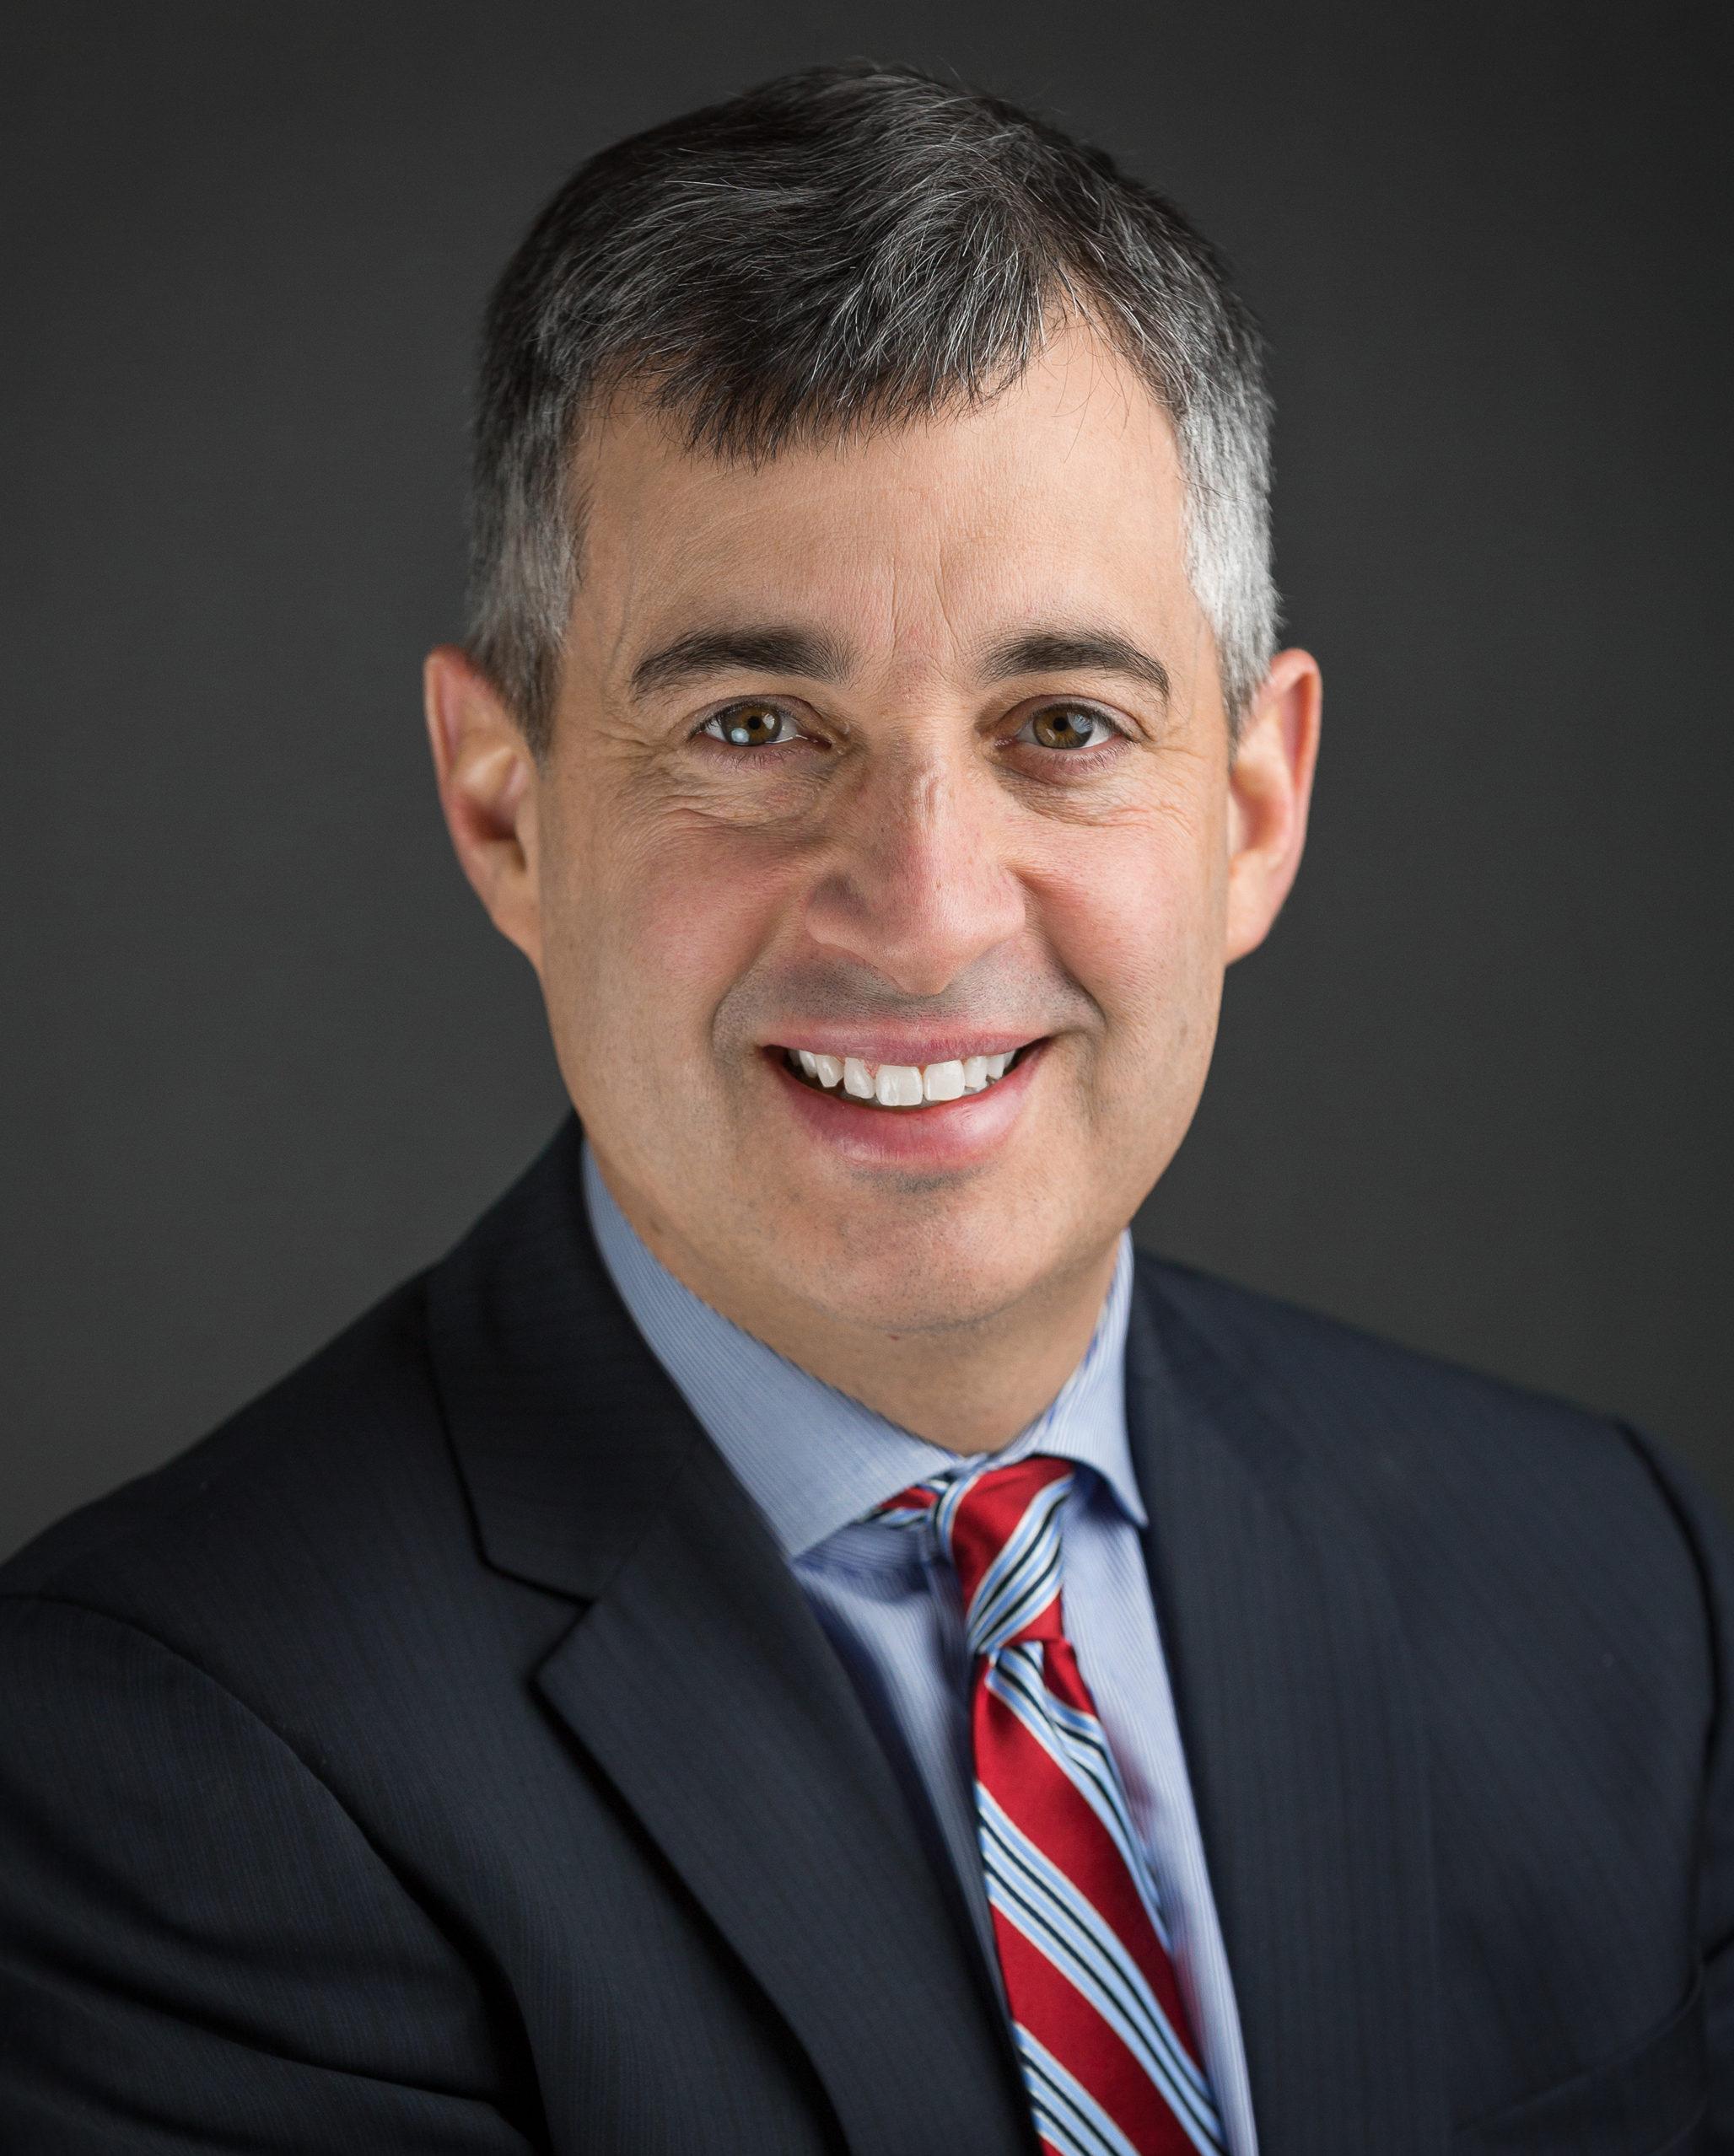 Sean P. Nelson Named UW System Vice President for Finance | News